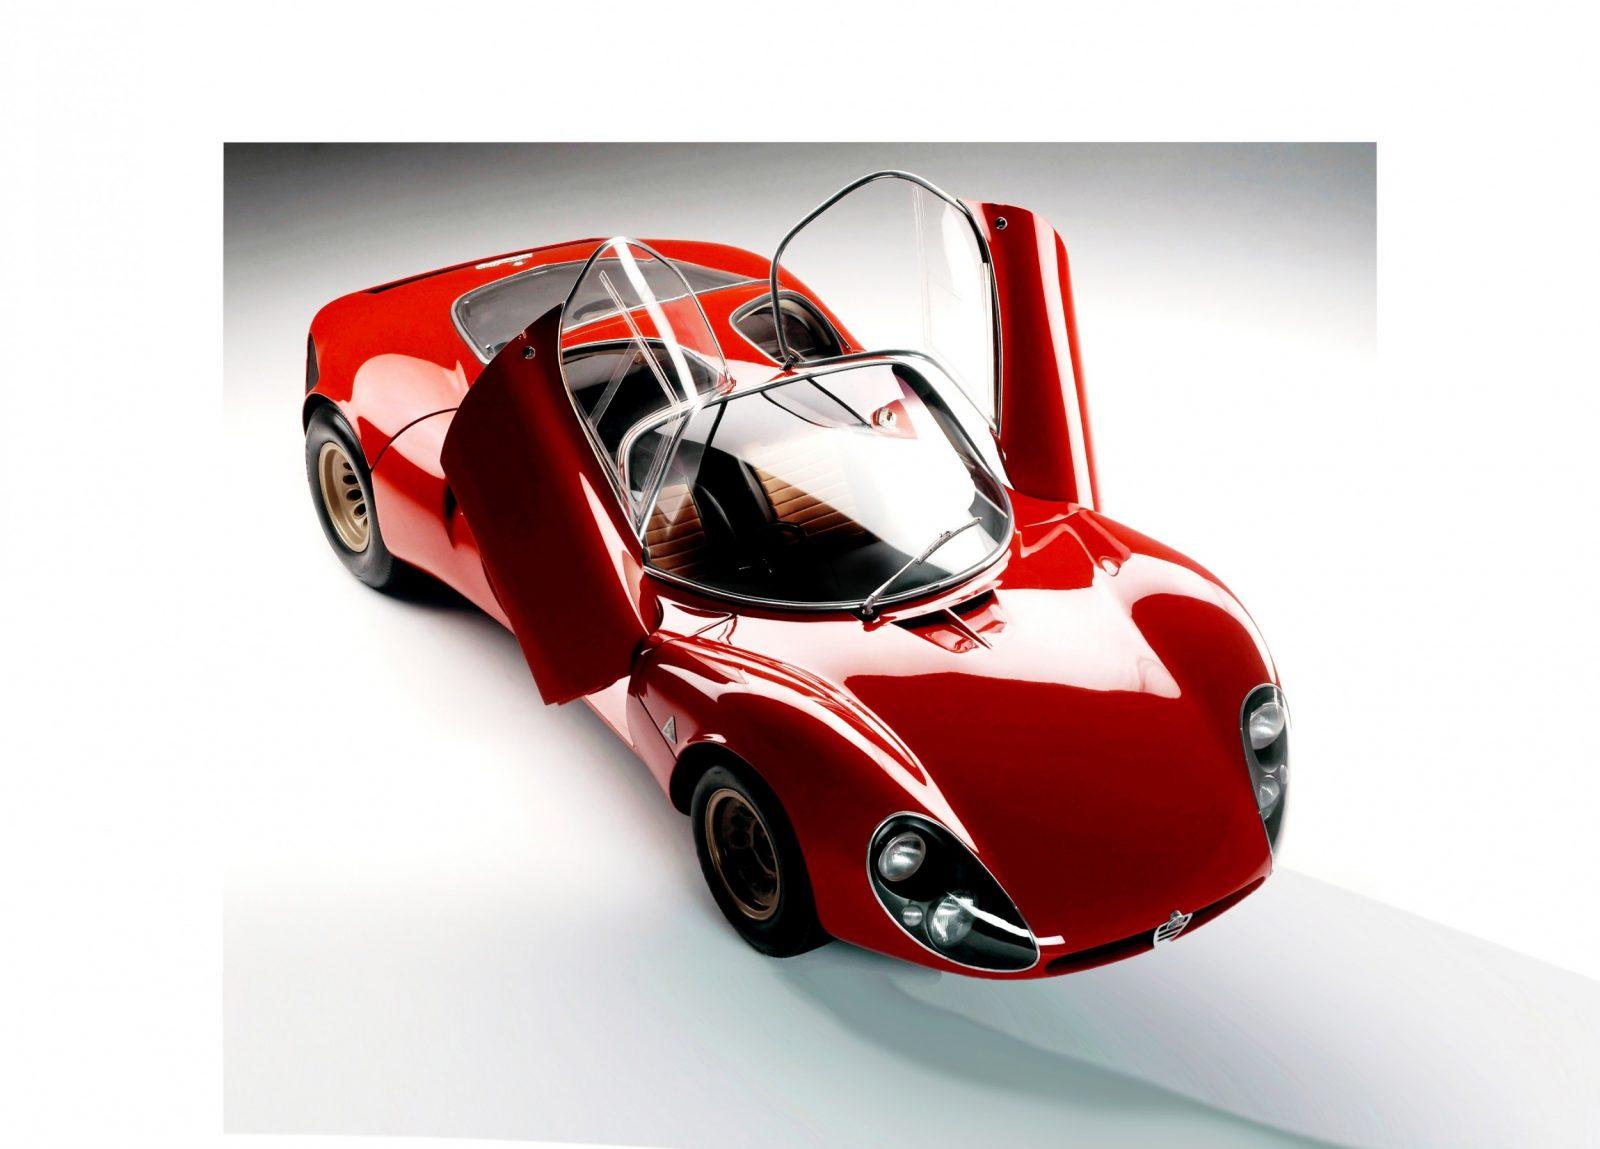 Alfa-Romeo-Tipo-33-Stradale-Prototipo-1967-9999999